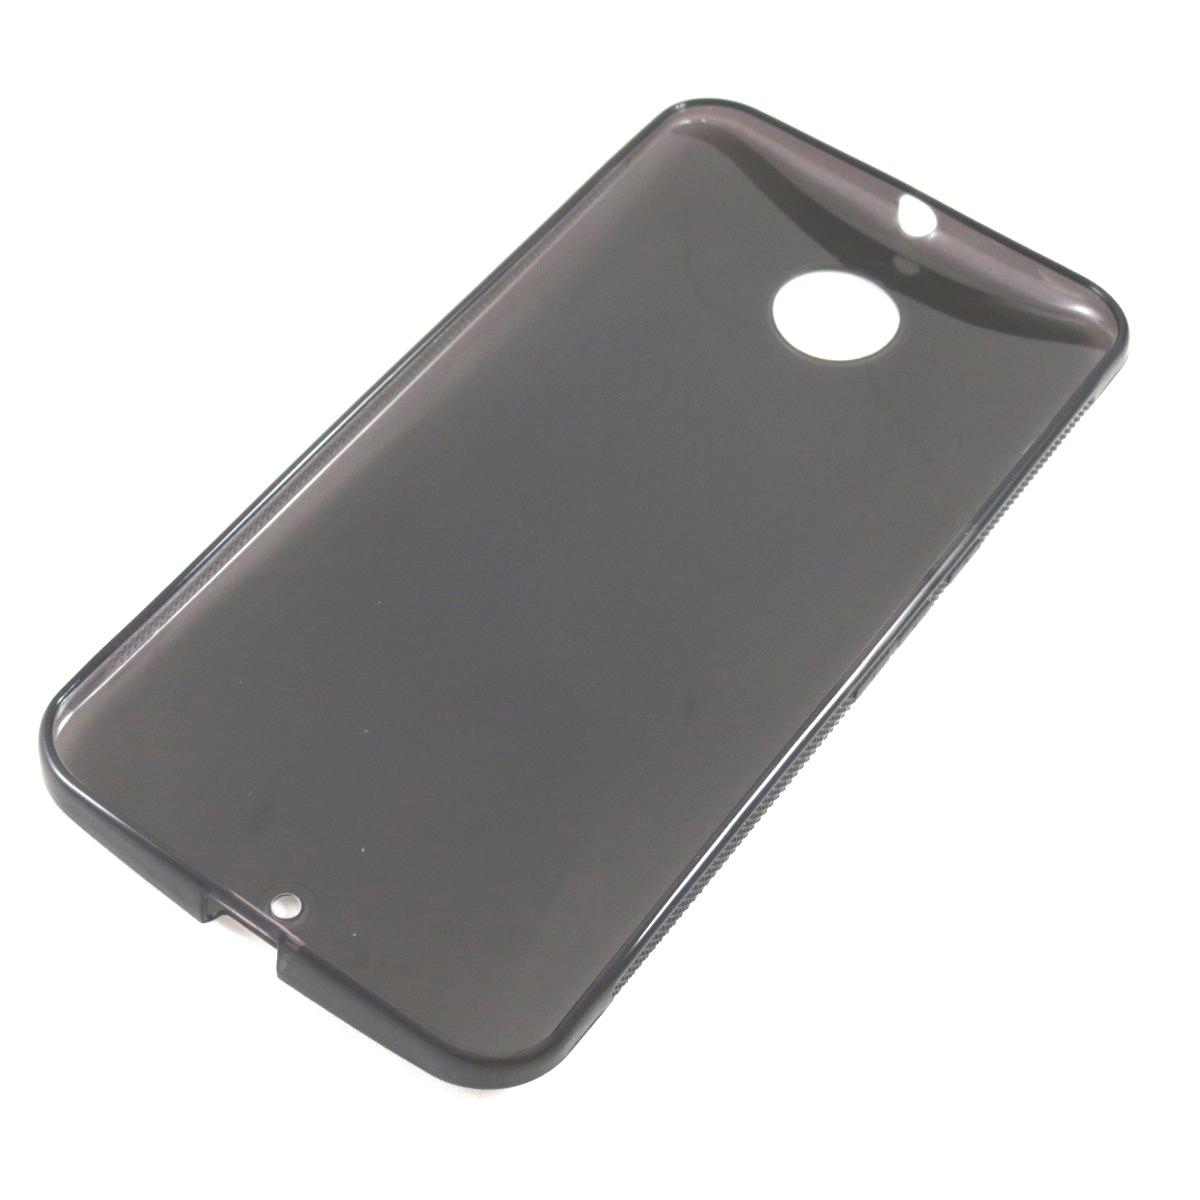 Capa Nexus 6 - Fumê Silicone TPU